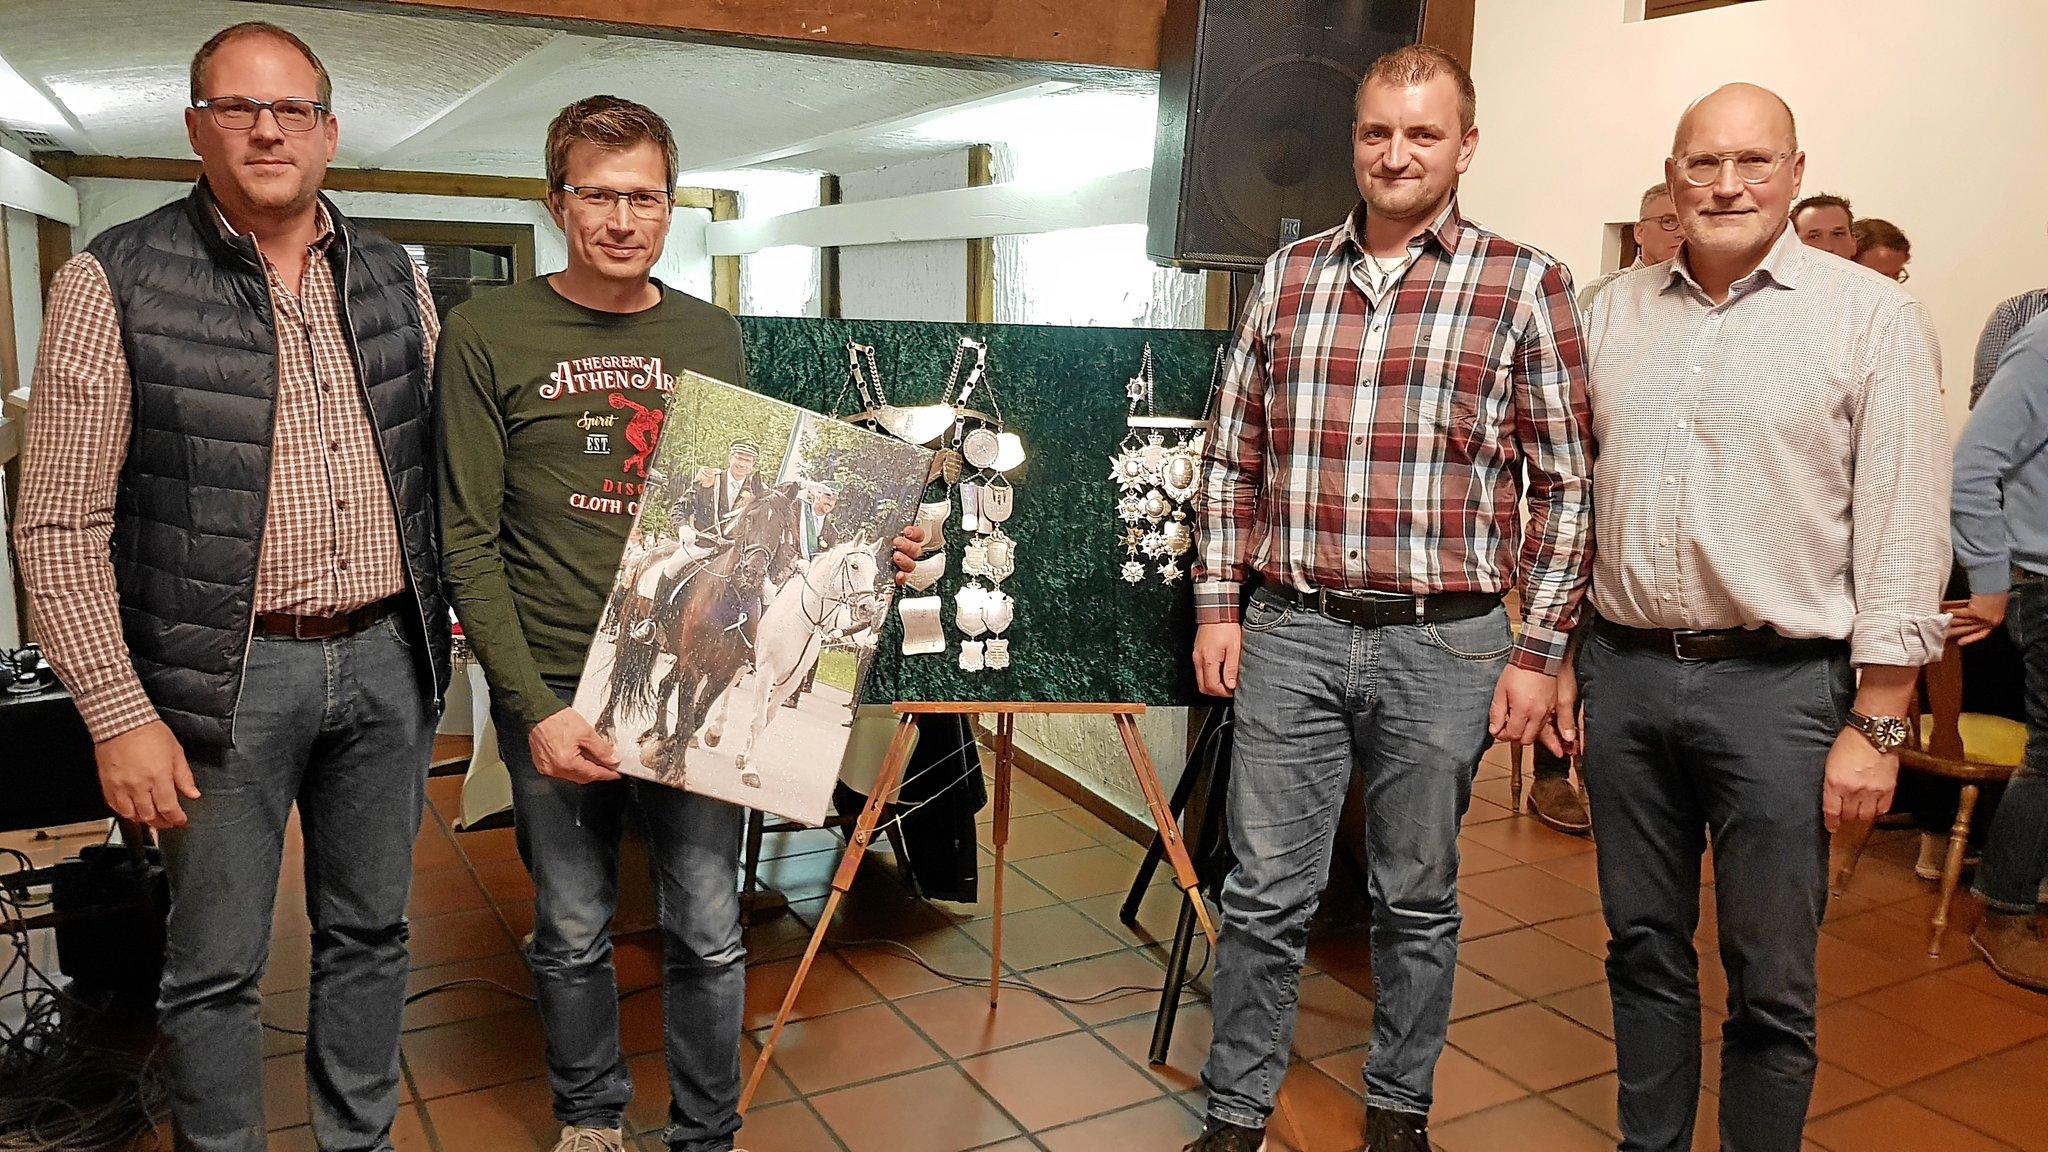 Johannes Kemna ist Ehrenoffizier: Herbstversammlung der Schützen in Dorf Hervest - Lokalkompass.de